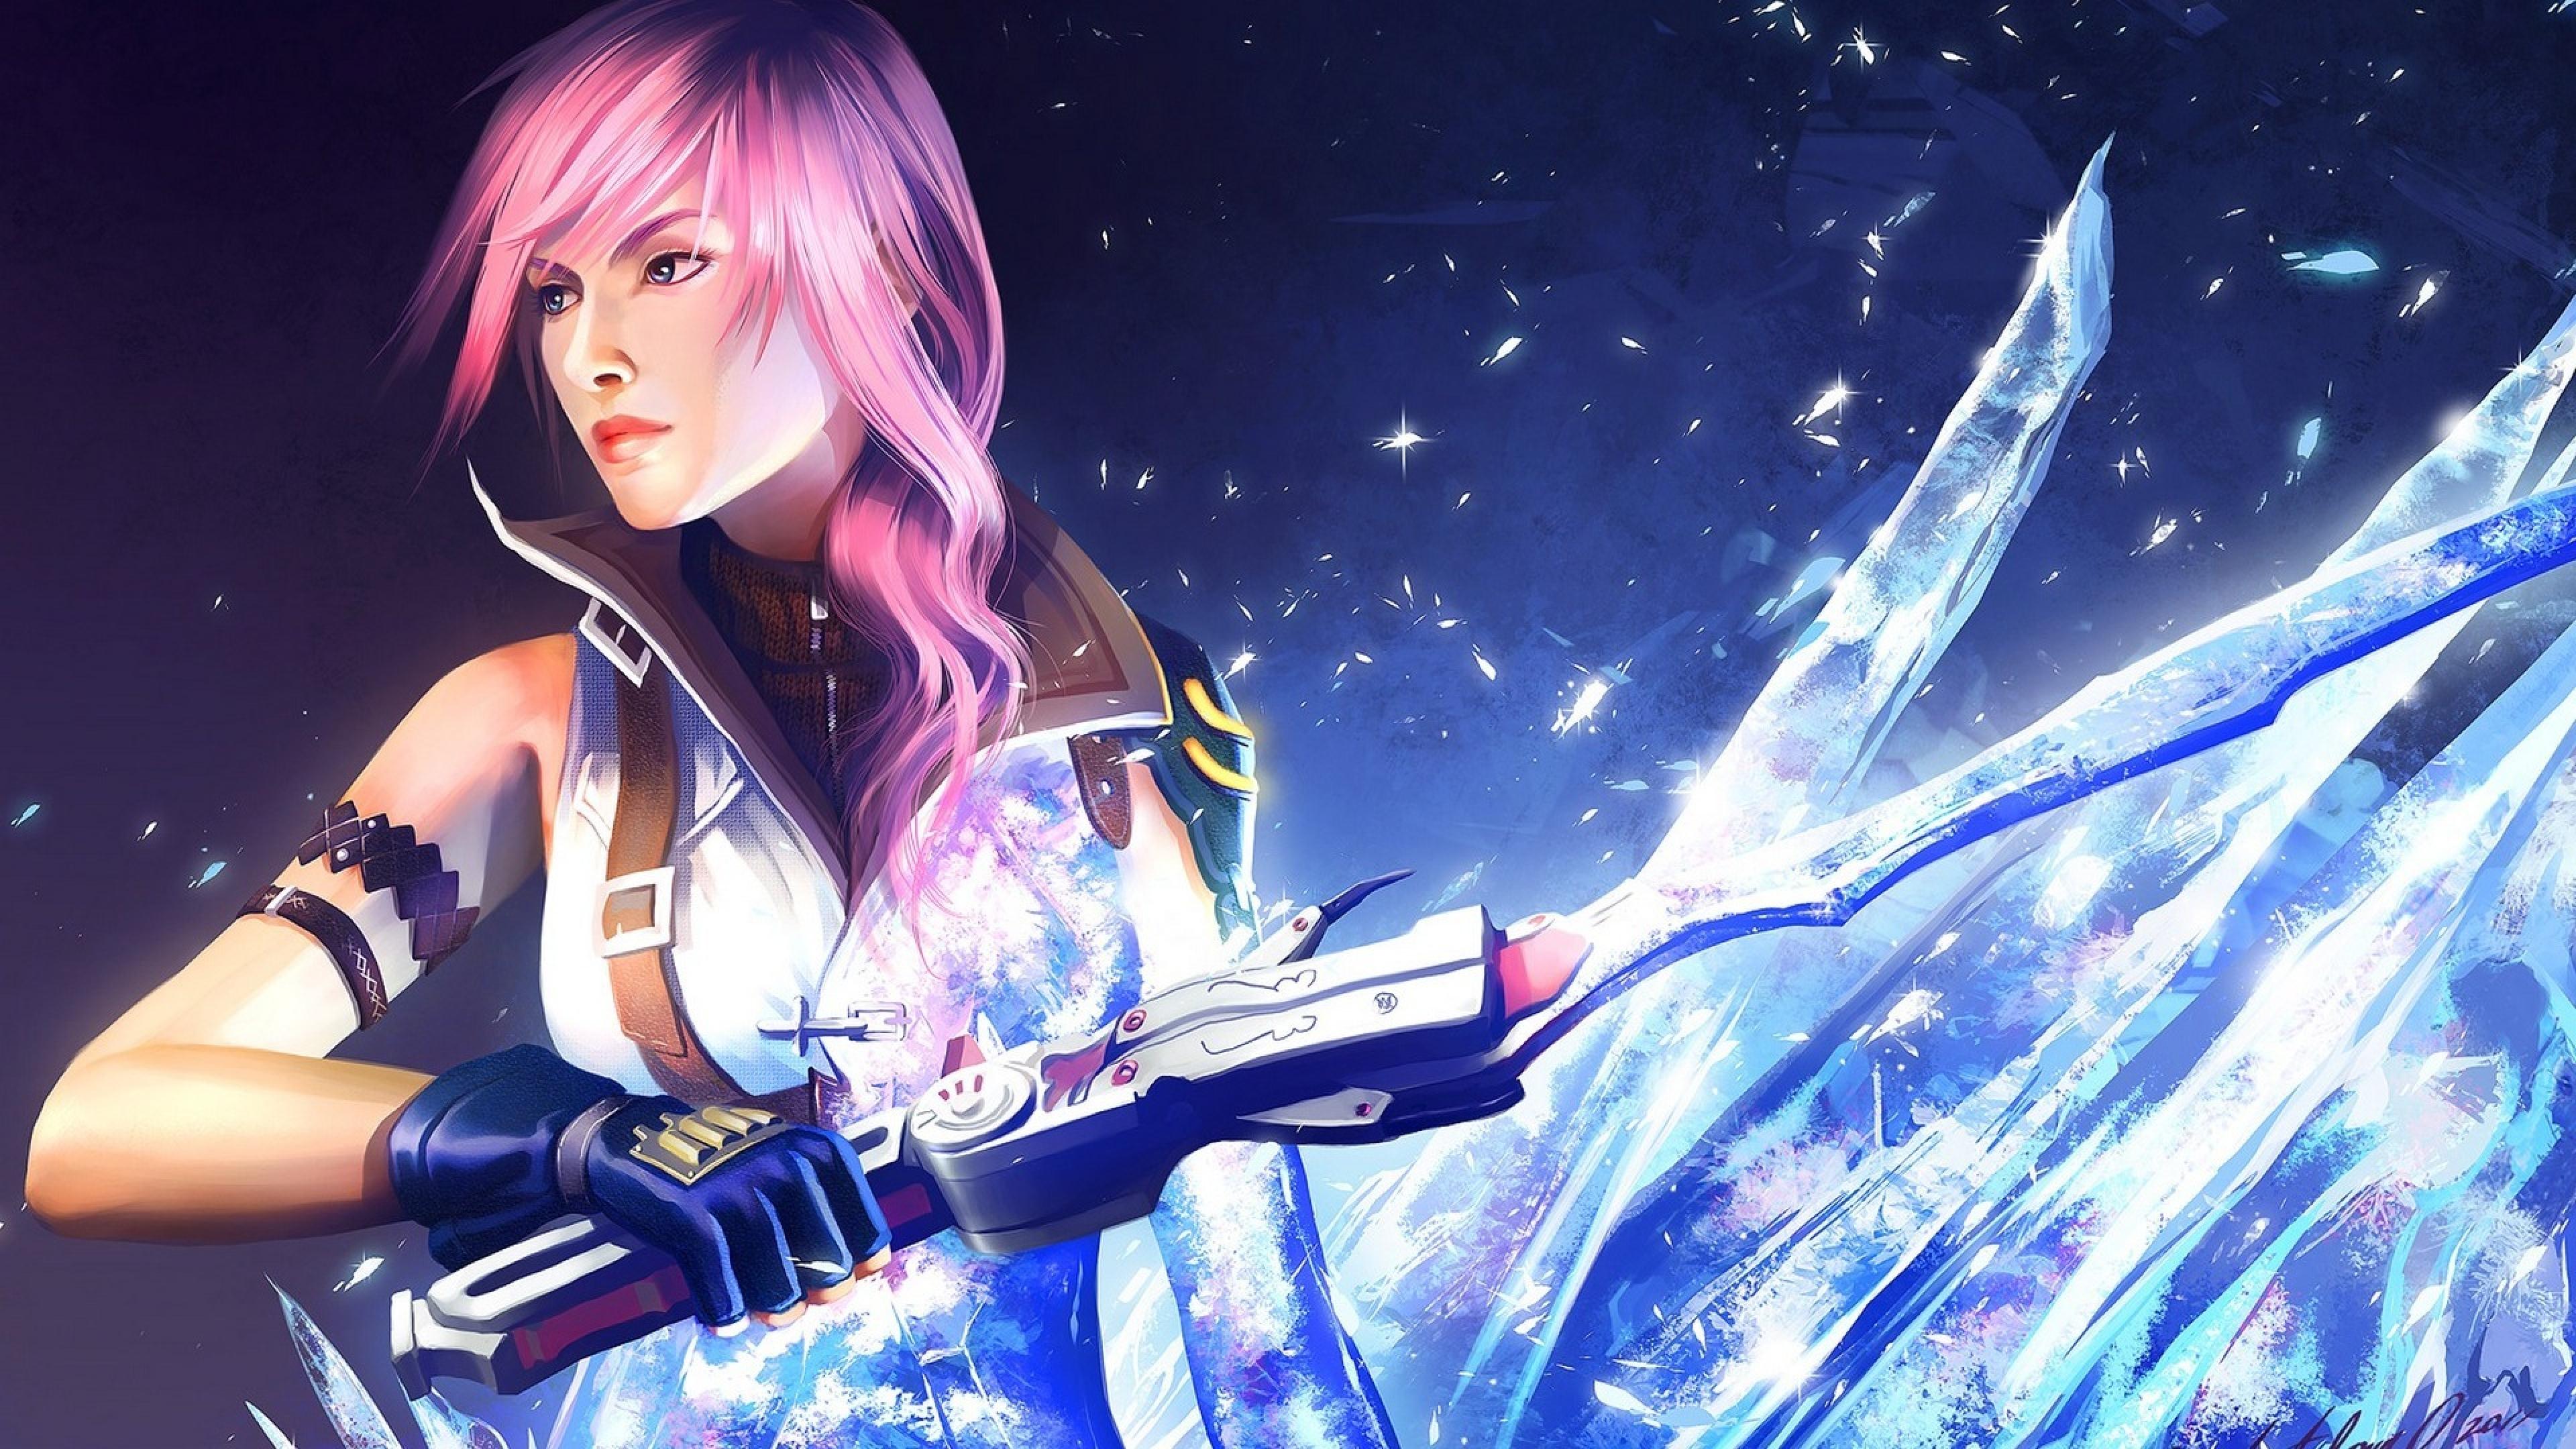 3840x2160 Final Fantasy Xiii Mathia Arkoniel Art 4k Wallpaper